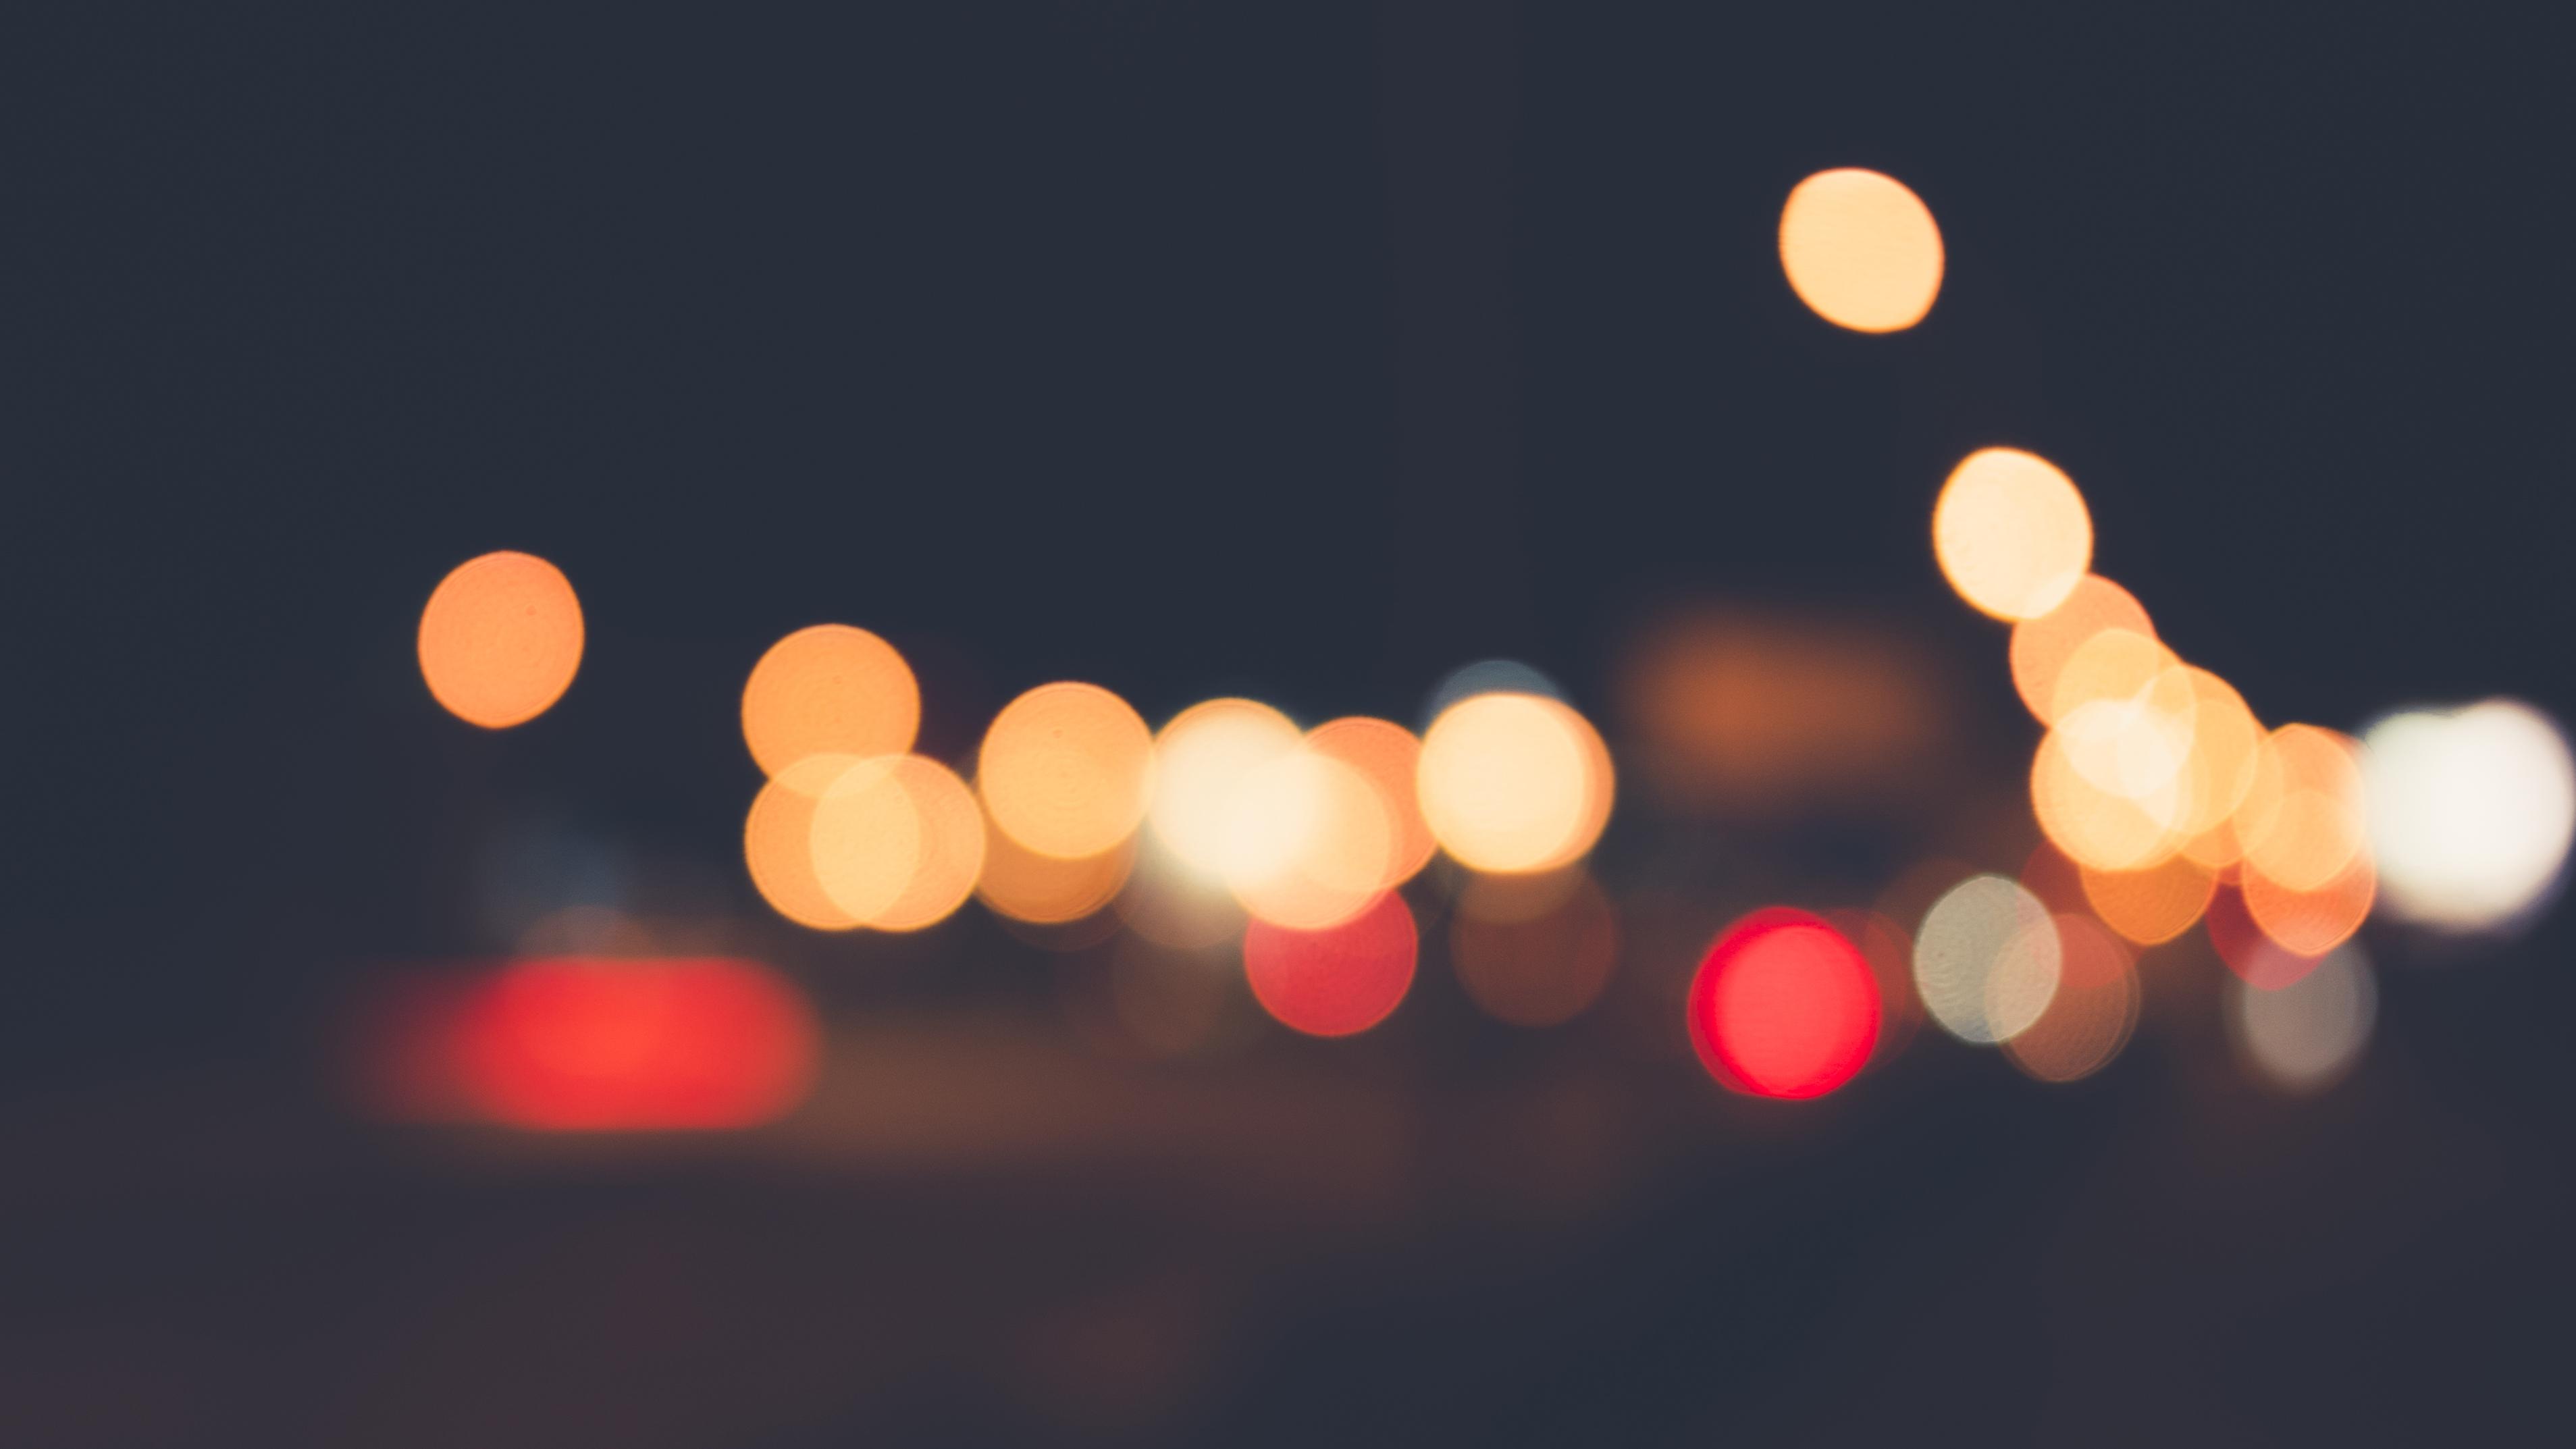 foto poca luz